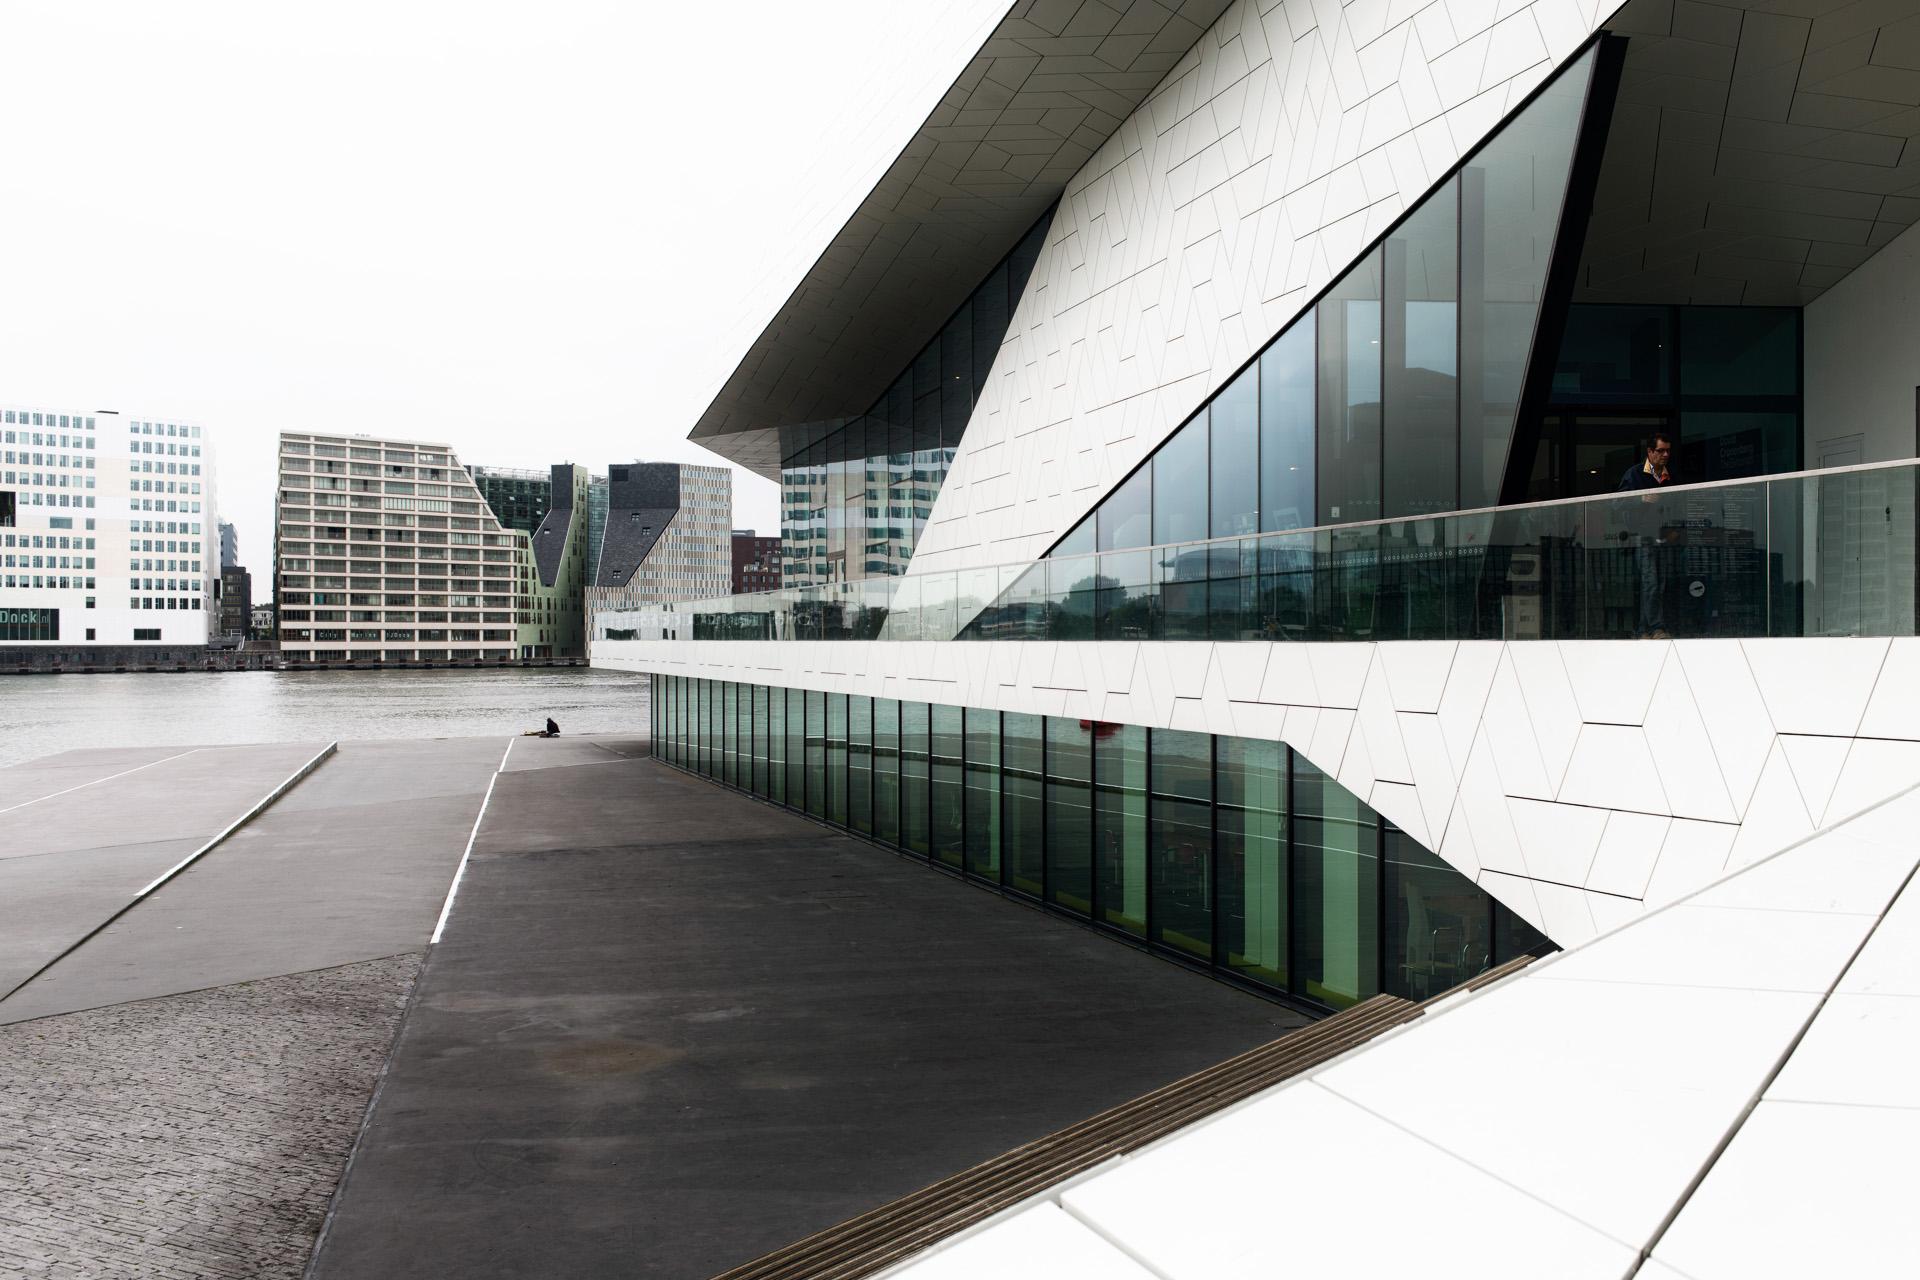 _nf - Amsterdam Eye Film Institut